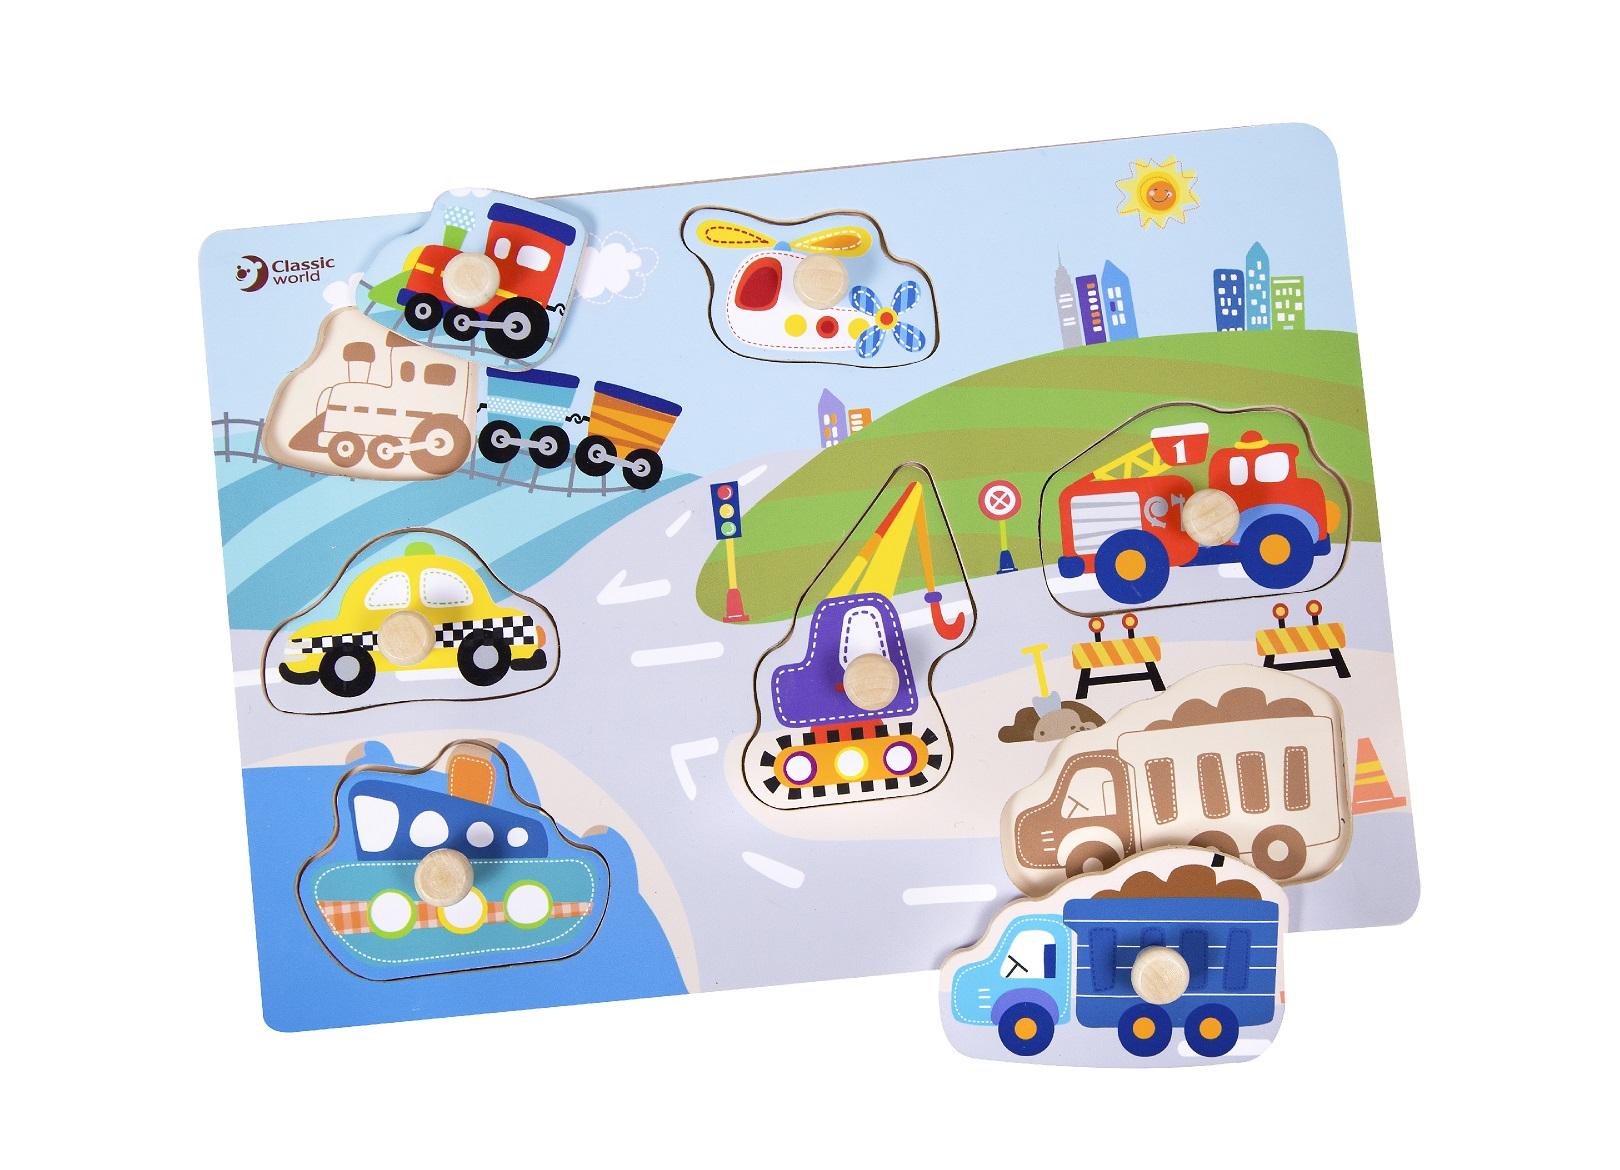 Encaje medios de transporte